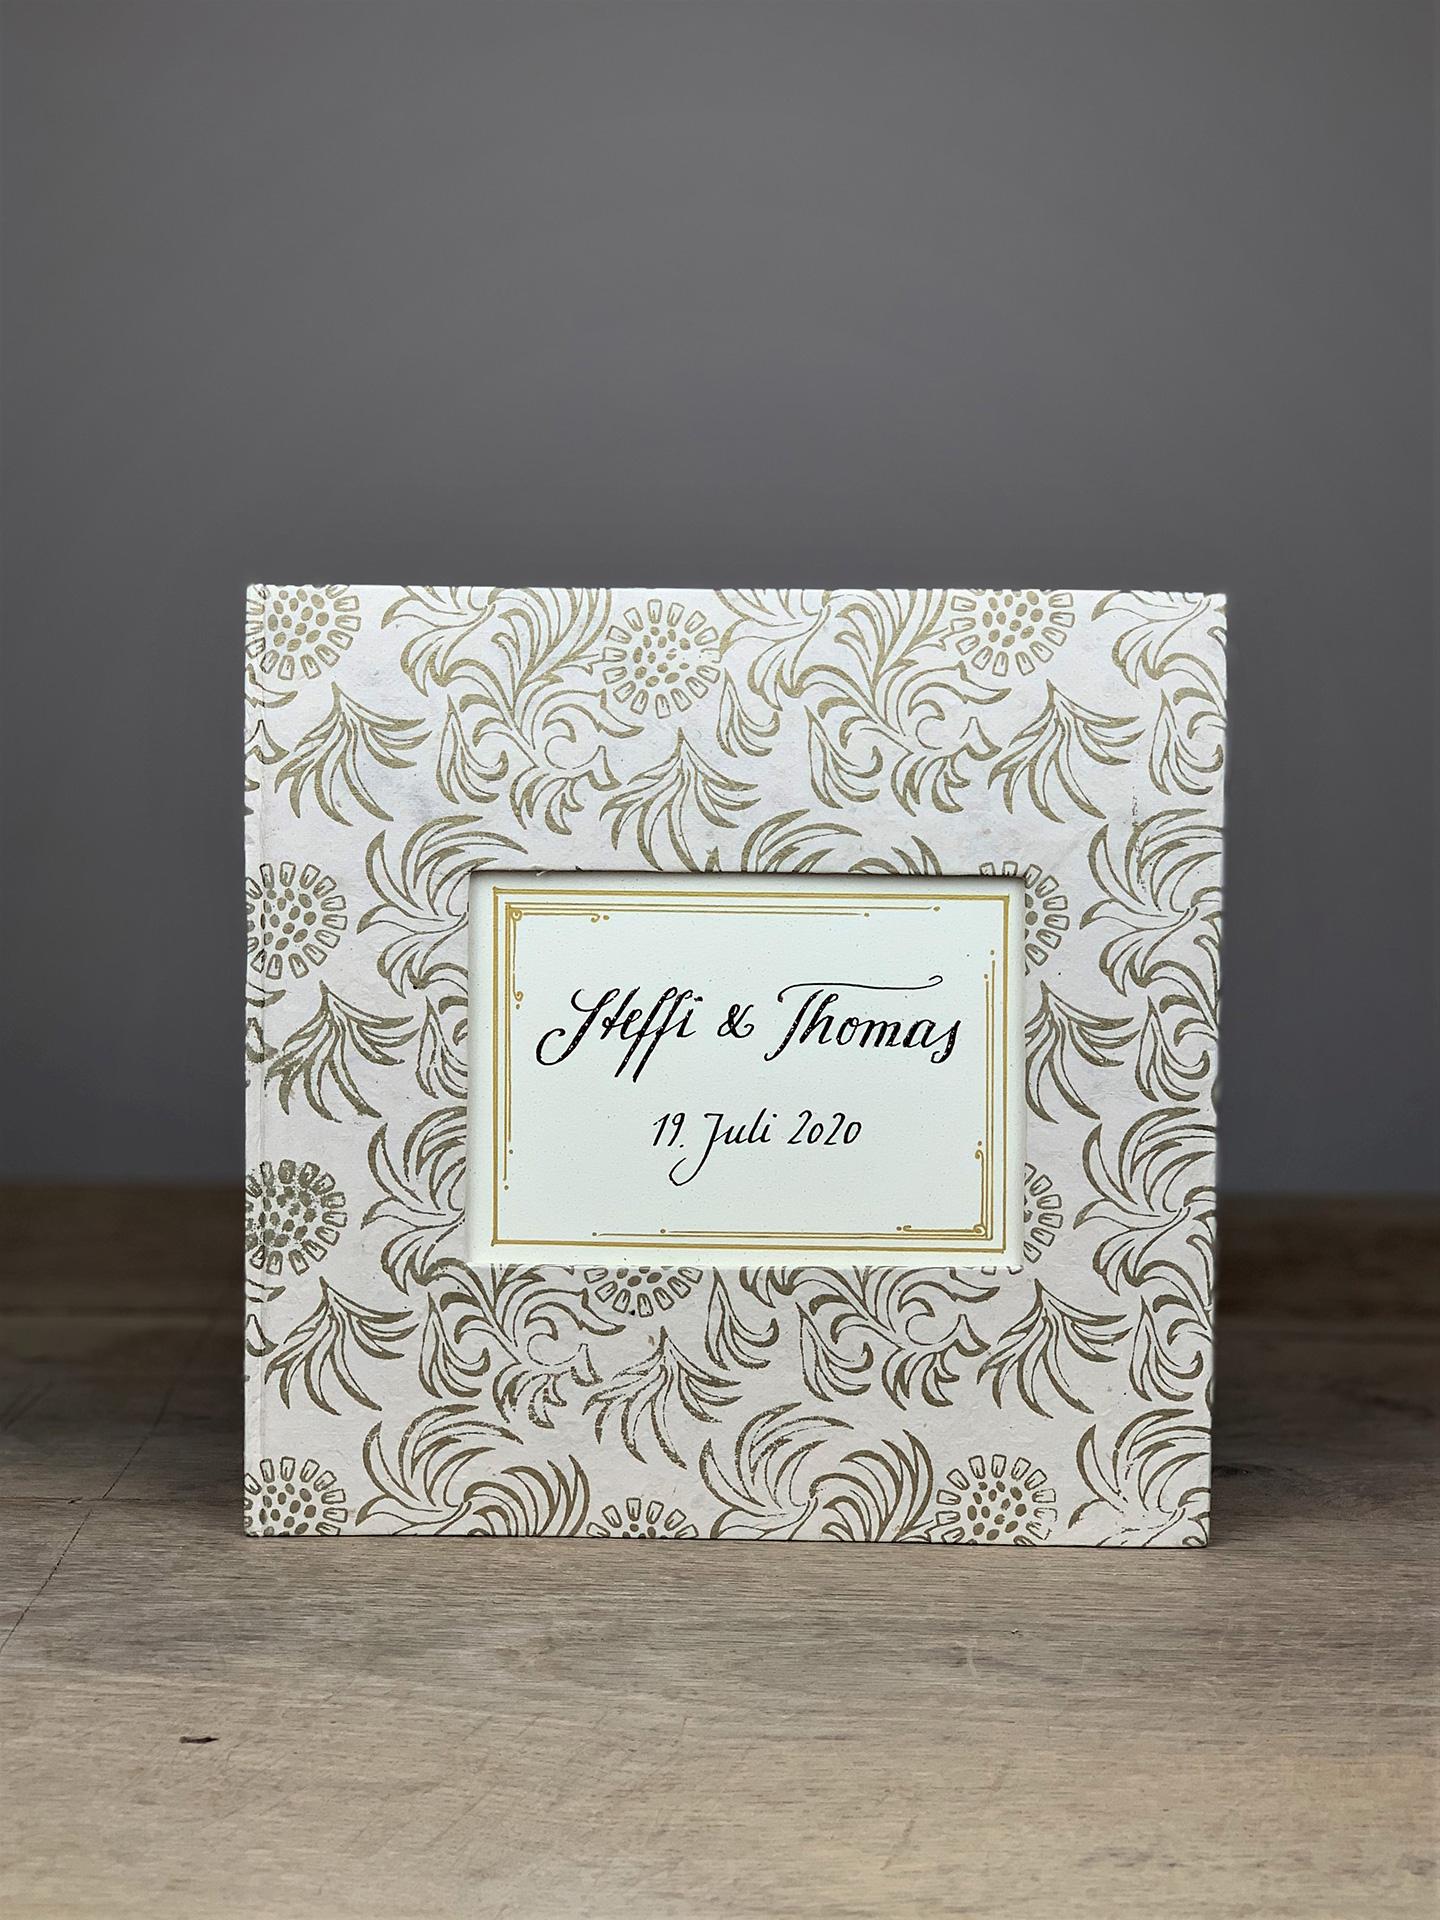 Album groß Quart gold/weiß Floral